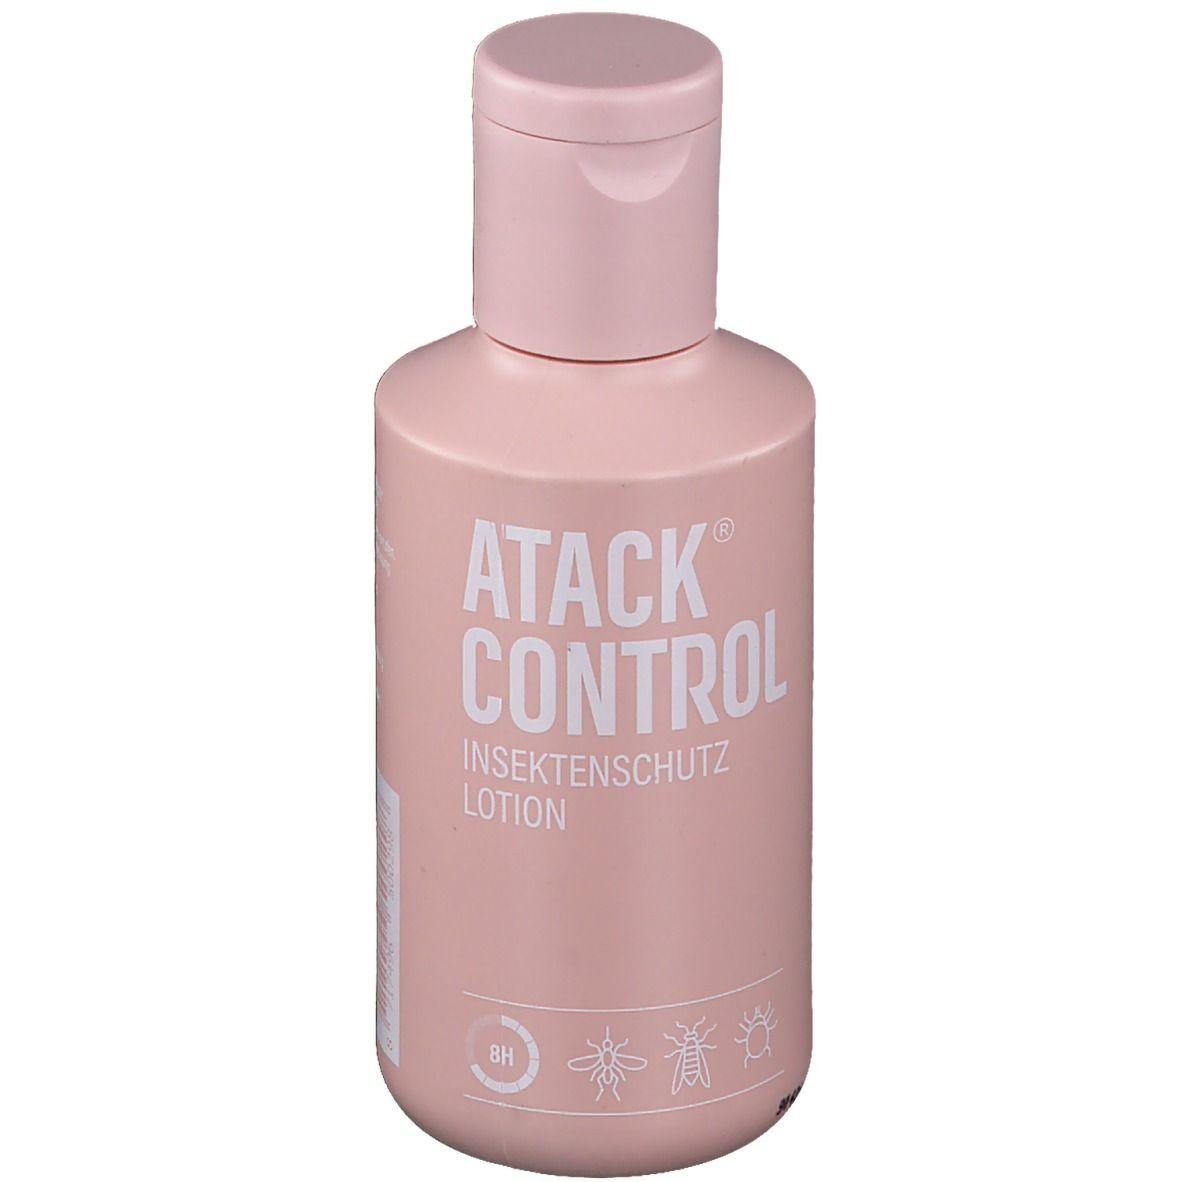 Atack Control Insektenschutz Lotion